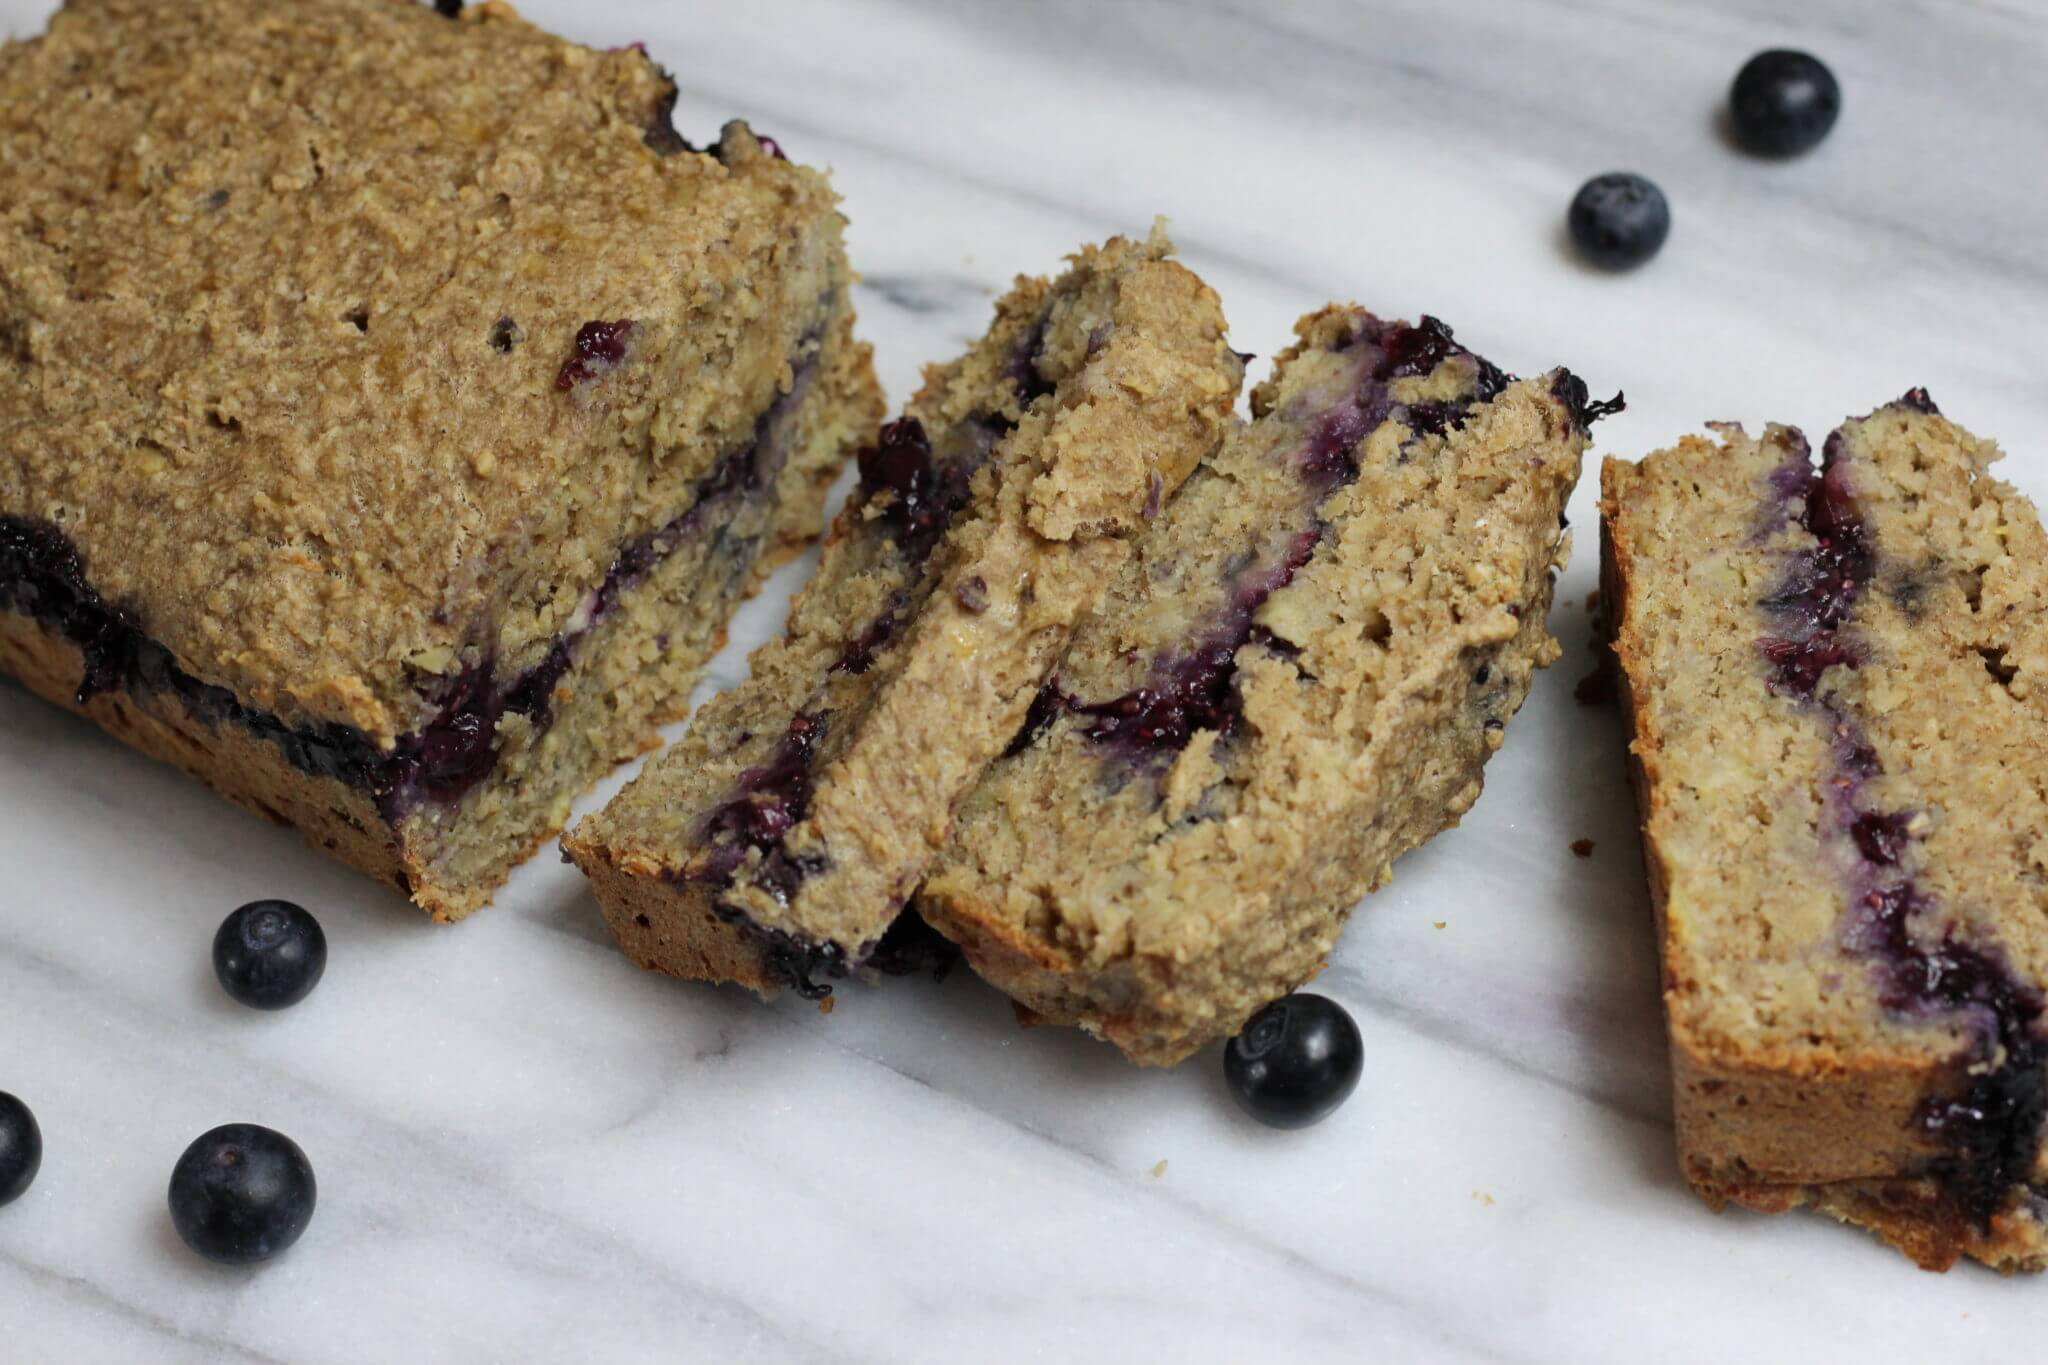 Stuffed Blueberry Banana Bread Wish Farms Recipe